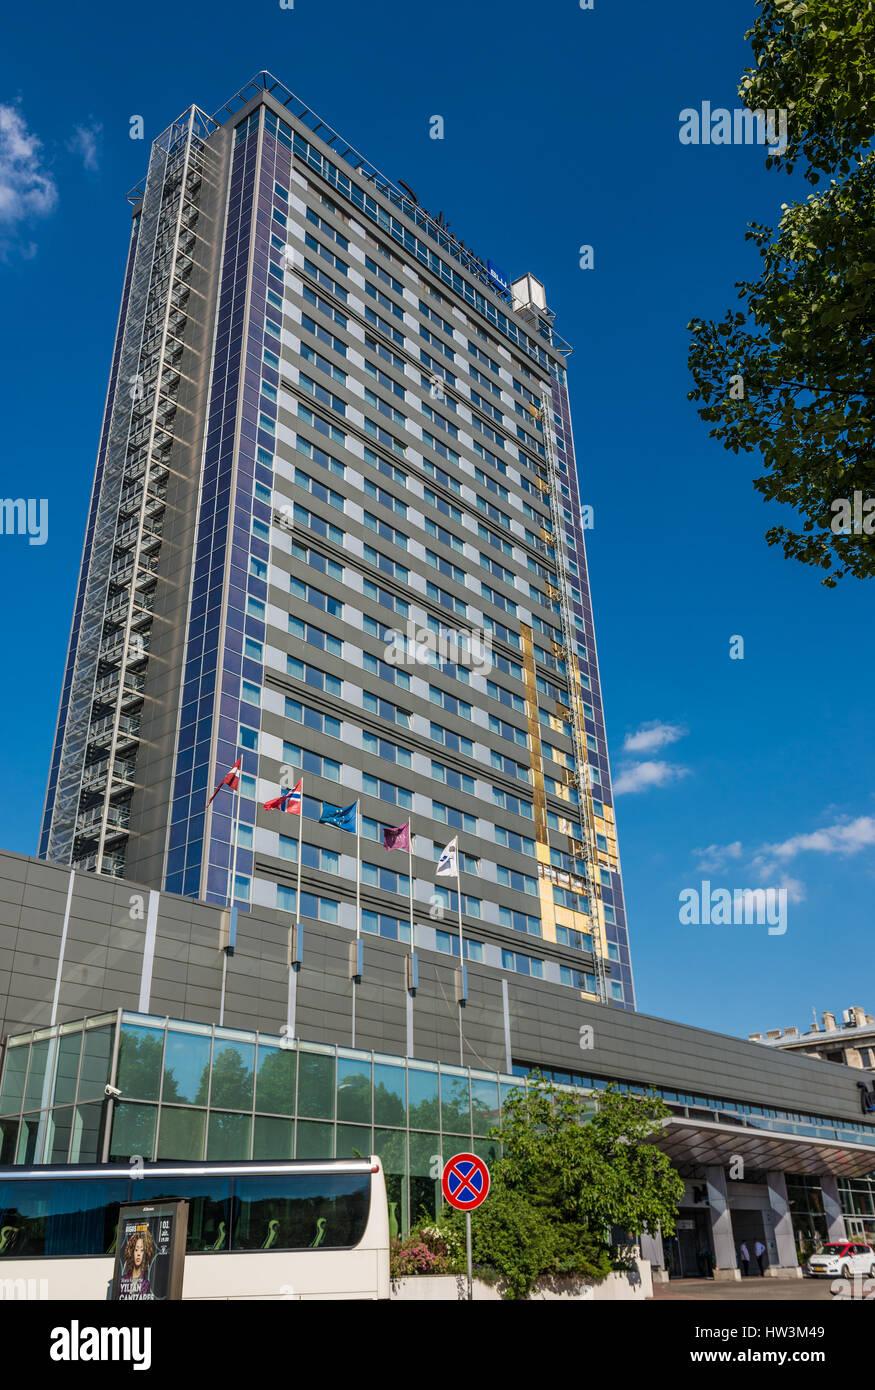 Radisson Blu Hotel in Riga, capital city of Republic of Latvia - Stock Image